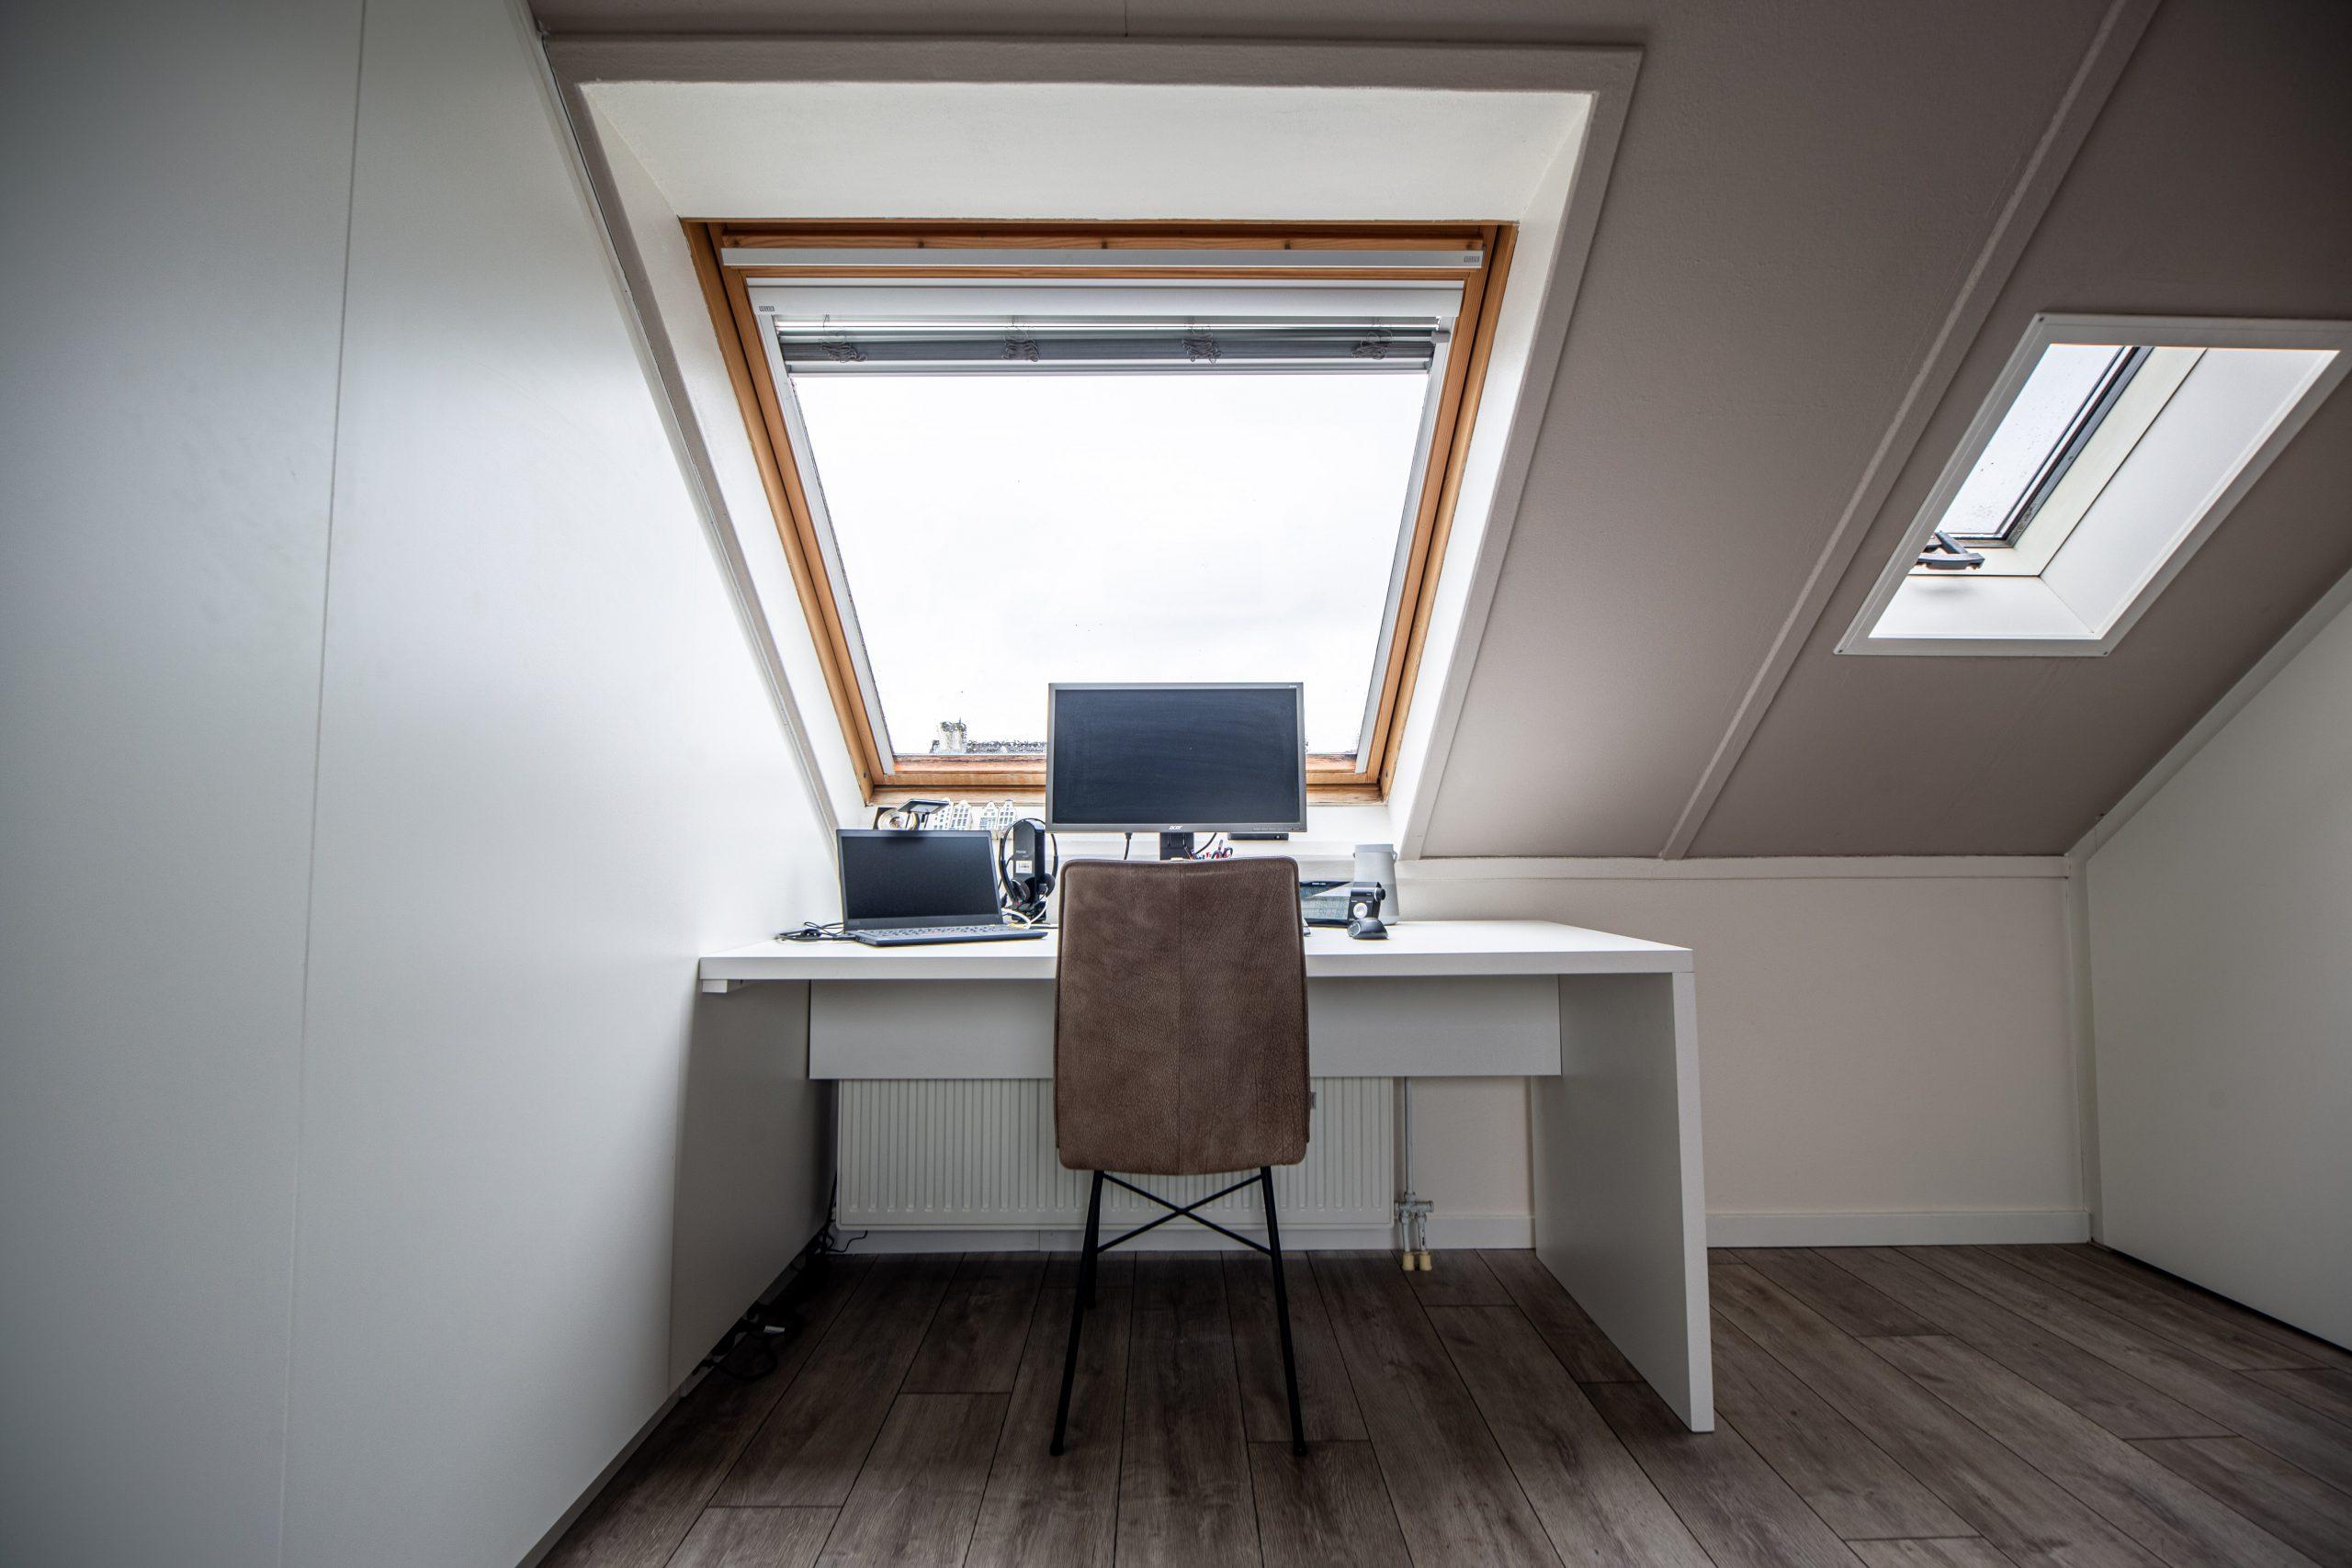 Sens Interieurs - thuiswerkplek op zolder - galerij4